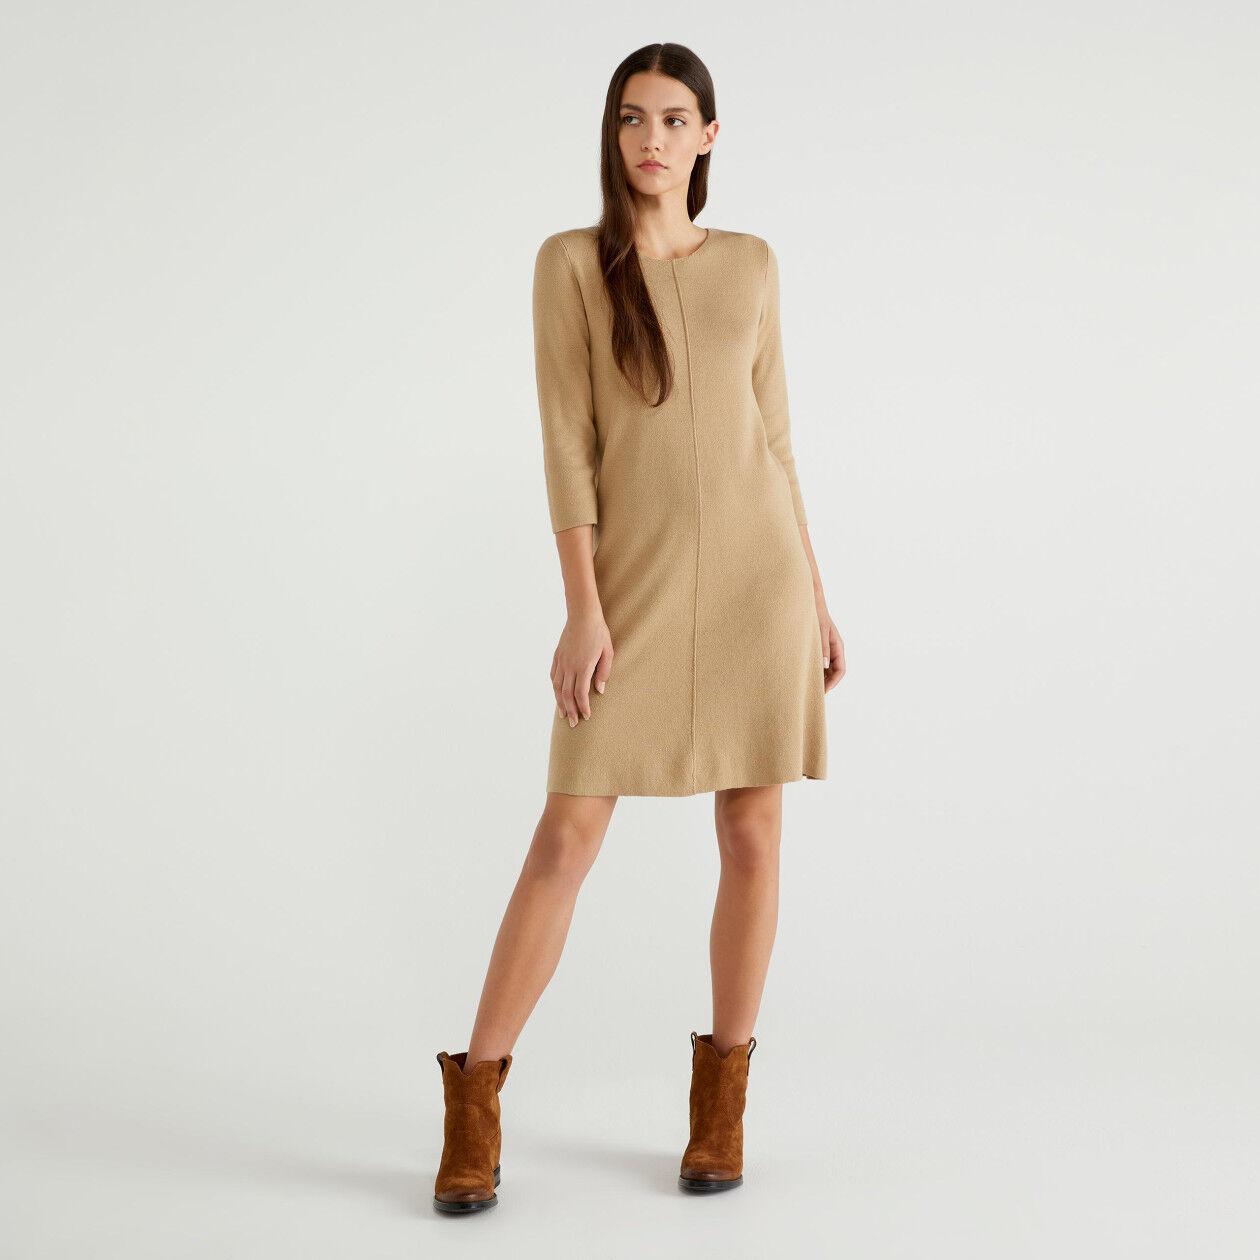 3/4 sleeve knit dress